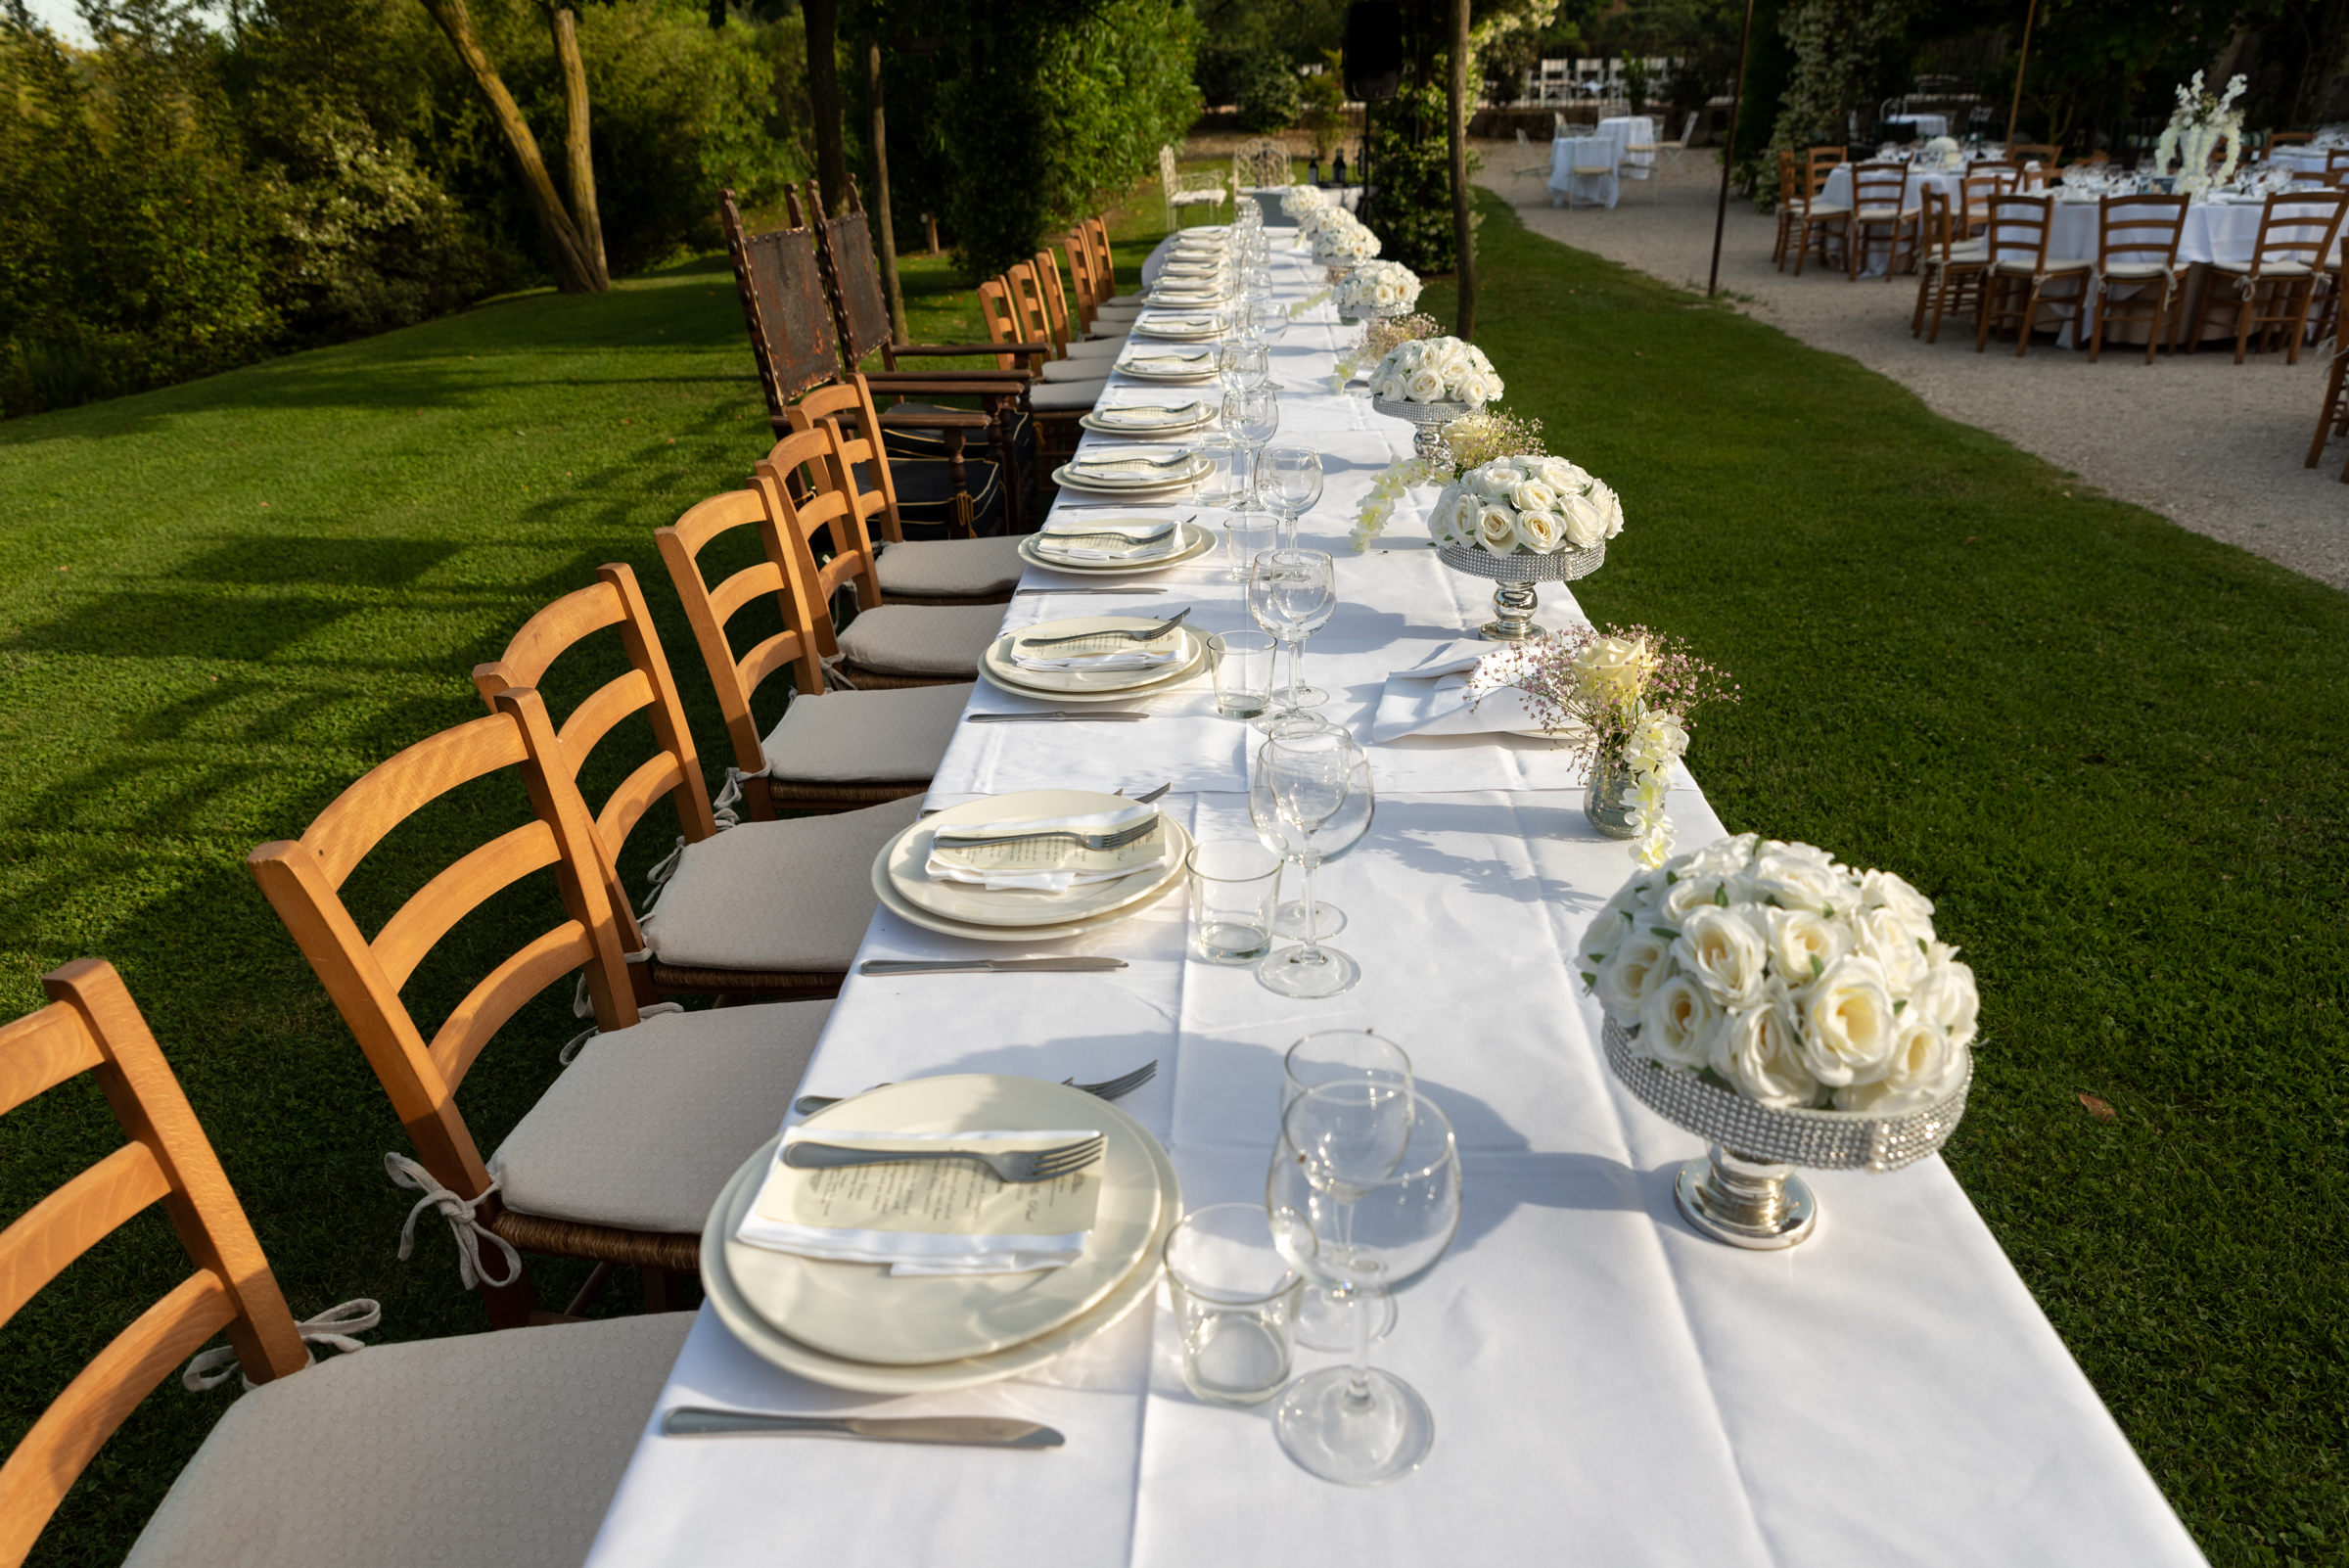 Borgo di tragliata Wedding-31.jpg